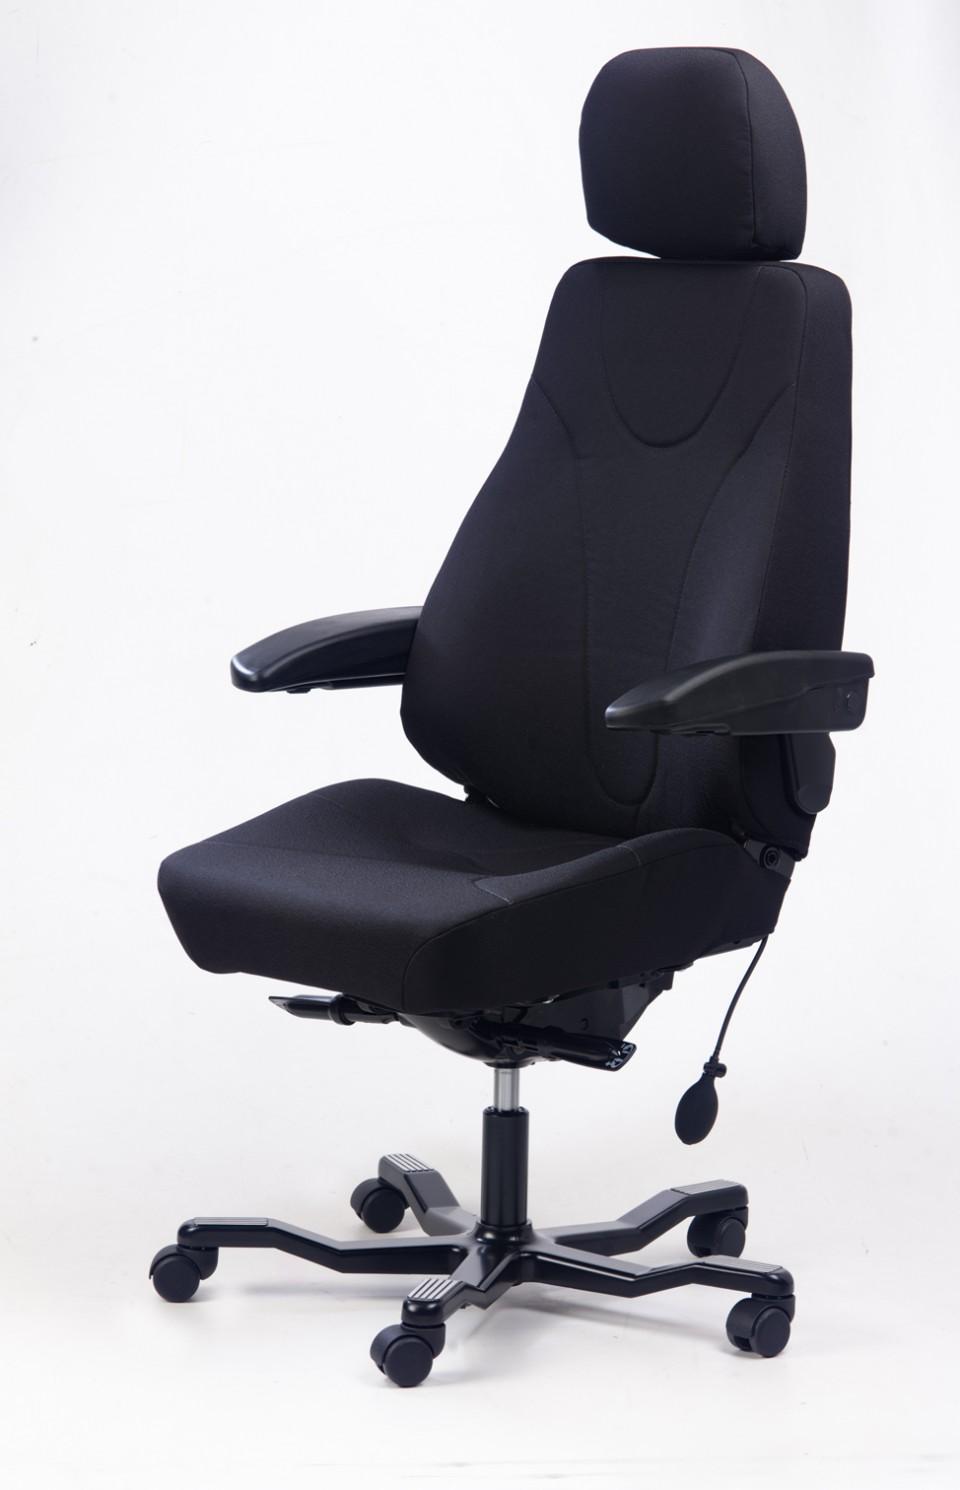 fauteuil de bureau ergonomique concerto